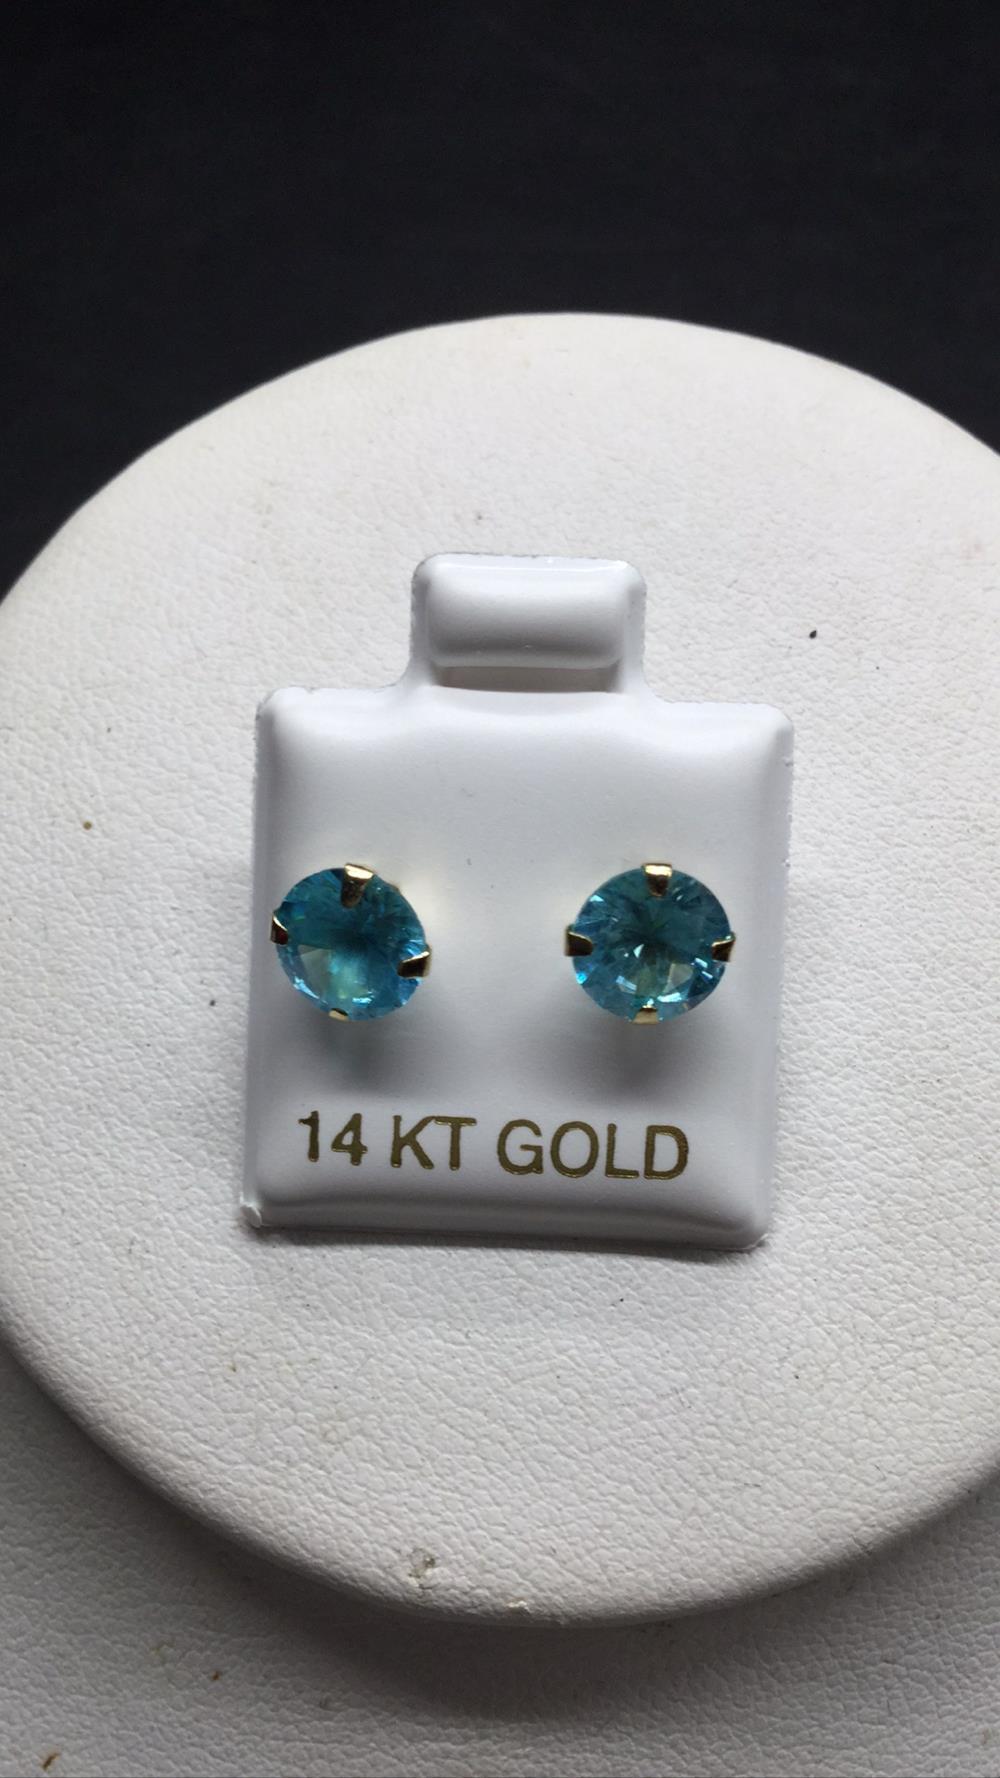 3 ct. aquamarine stud earrings